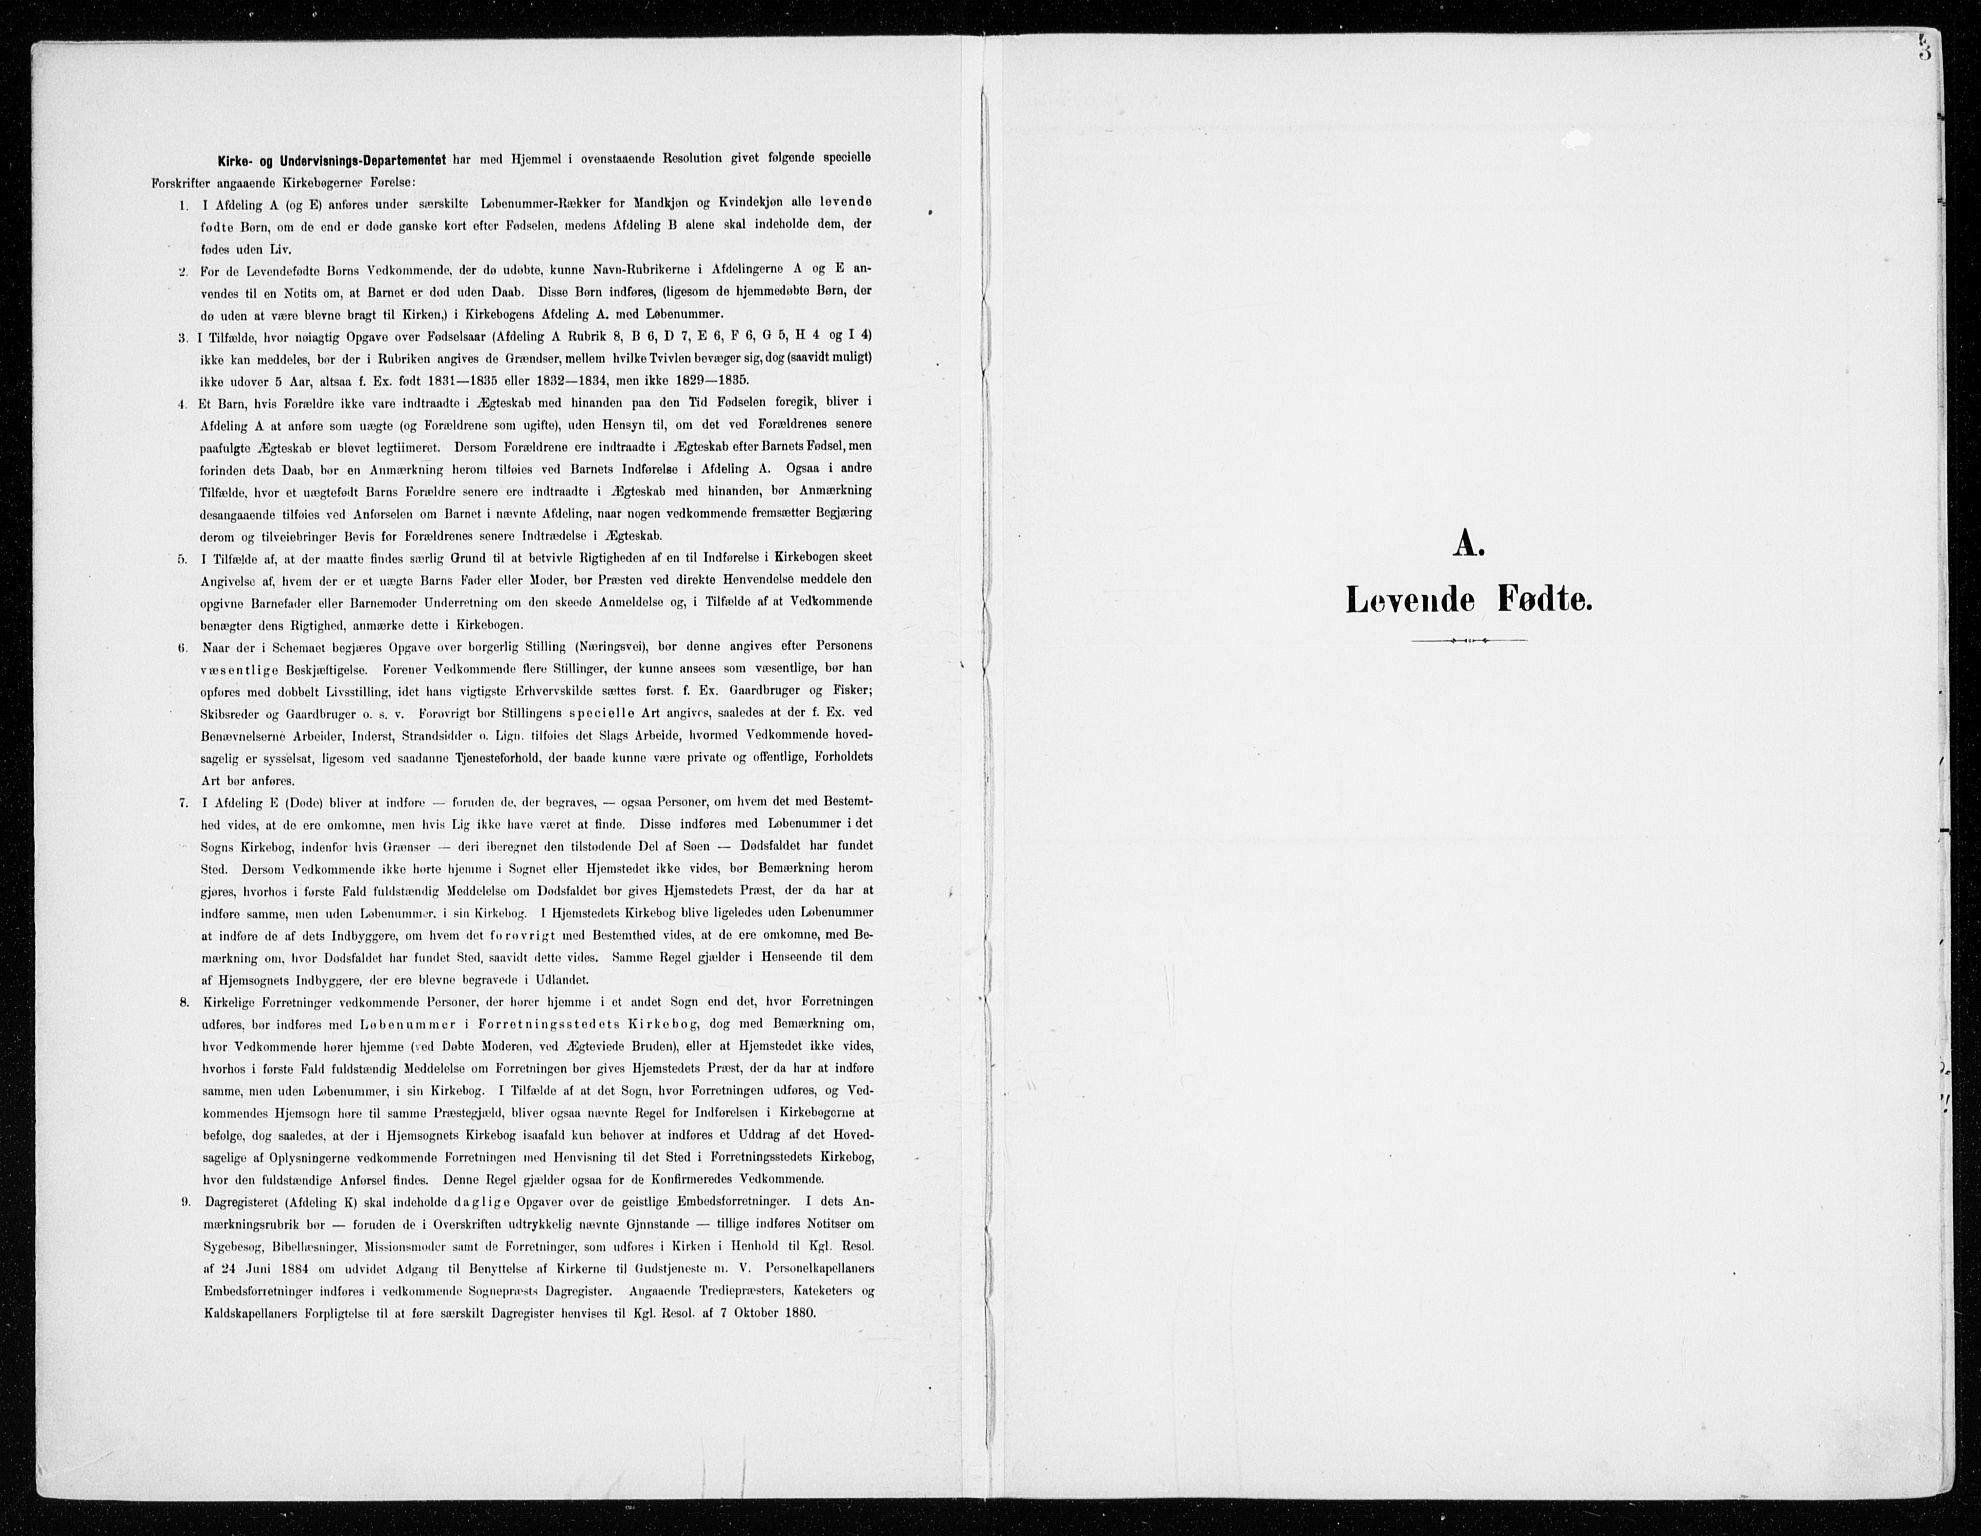 SAH, Fåberg prestekontor, Ministerialbok nr. 11, 1899-1913, s. 3